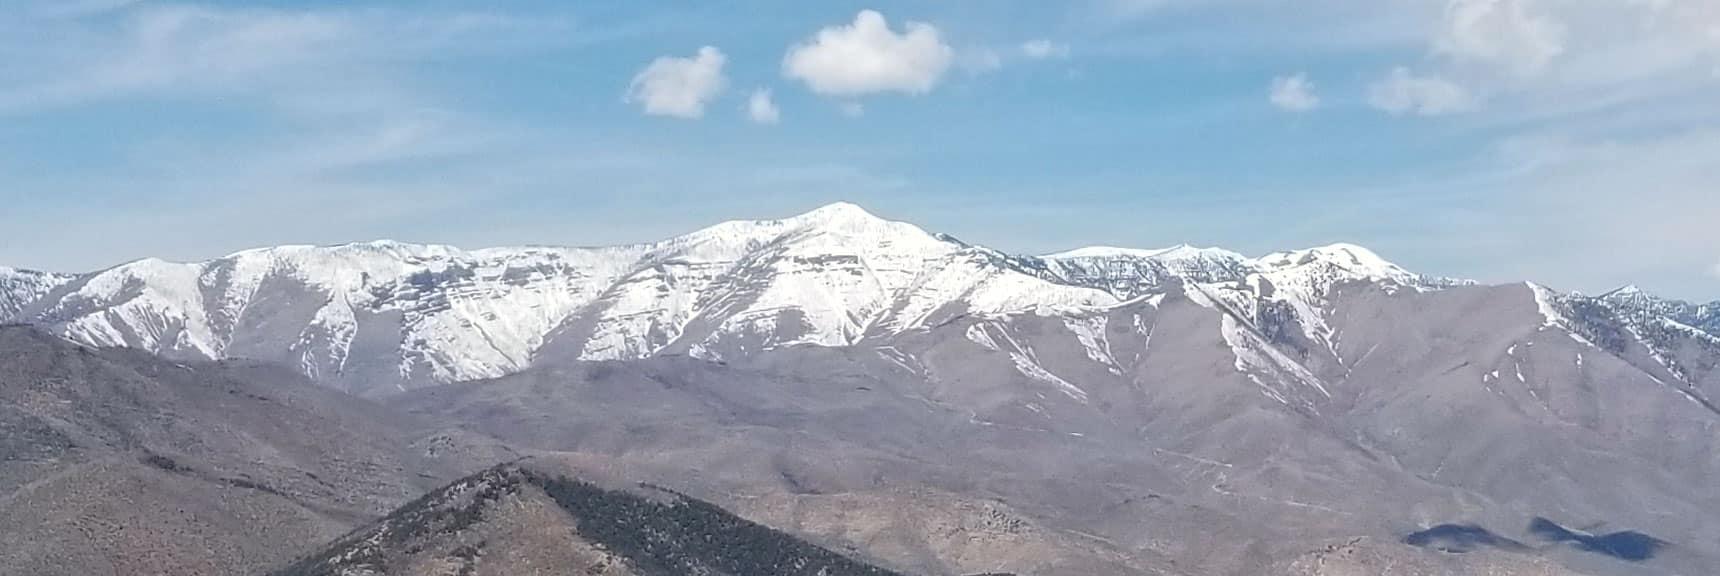 Griffith Peak in Mt Charleston Wilderness Viewed from 7800ft on Keystone Thrust Near La Madre Mt, Nevada